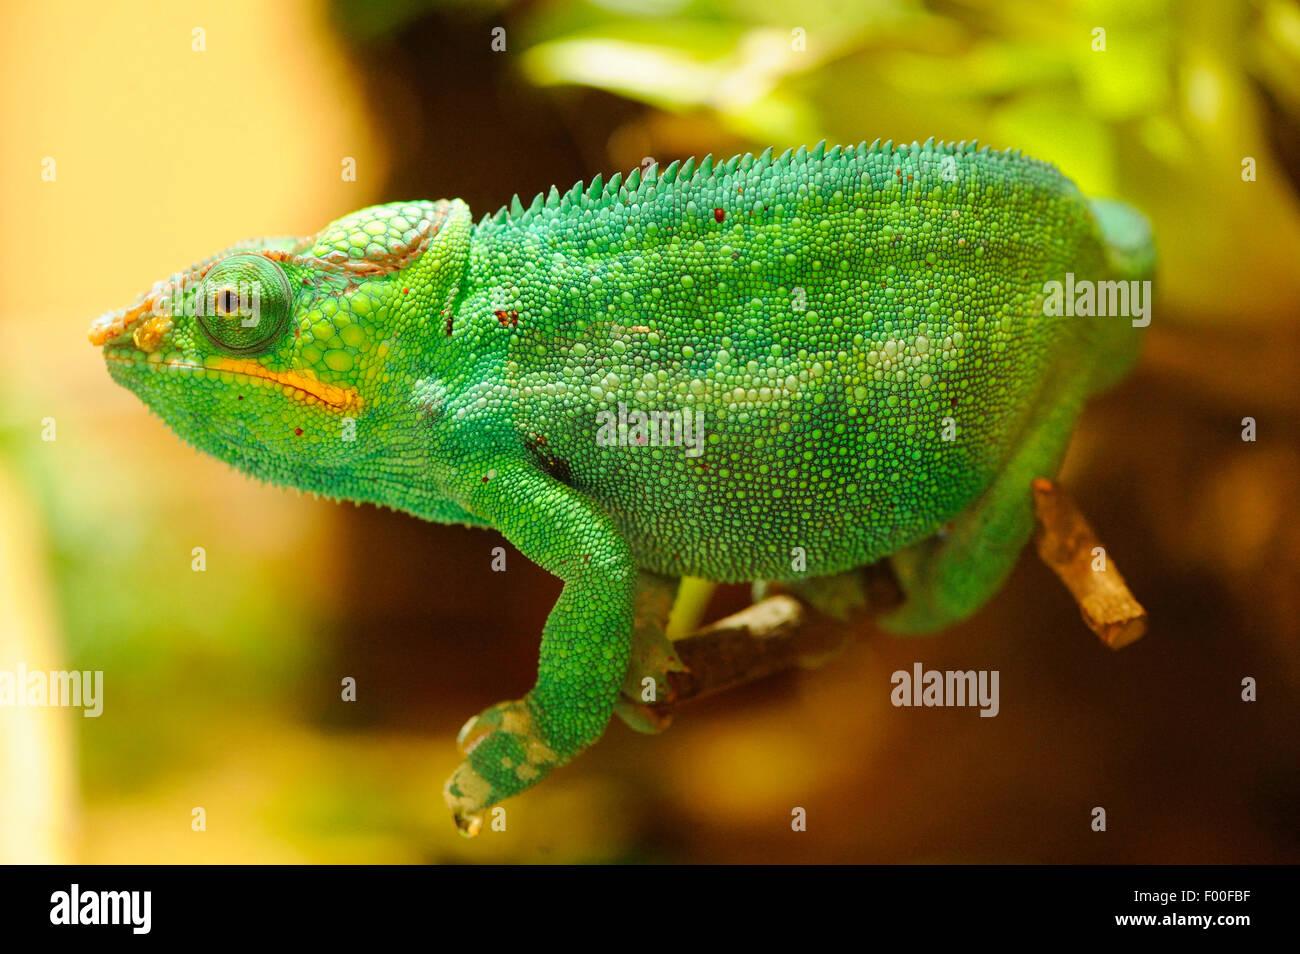 Panther chameleon (Furcifer pardalis, Chamaeleo pardalis), in a terrarium - Stock Image